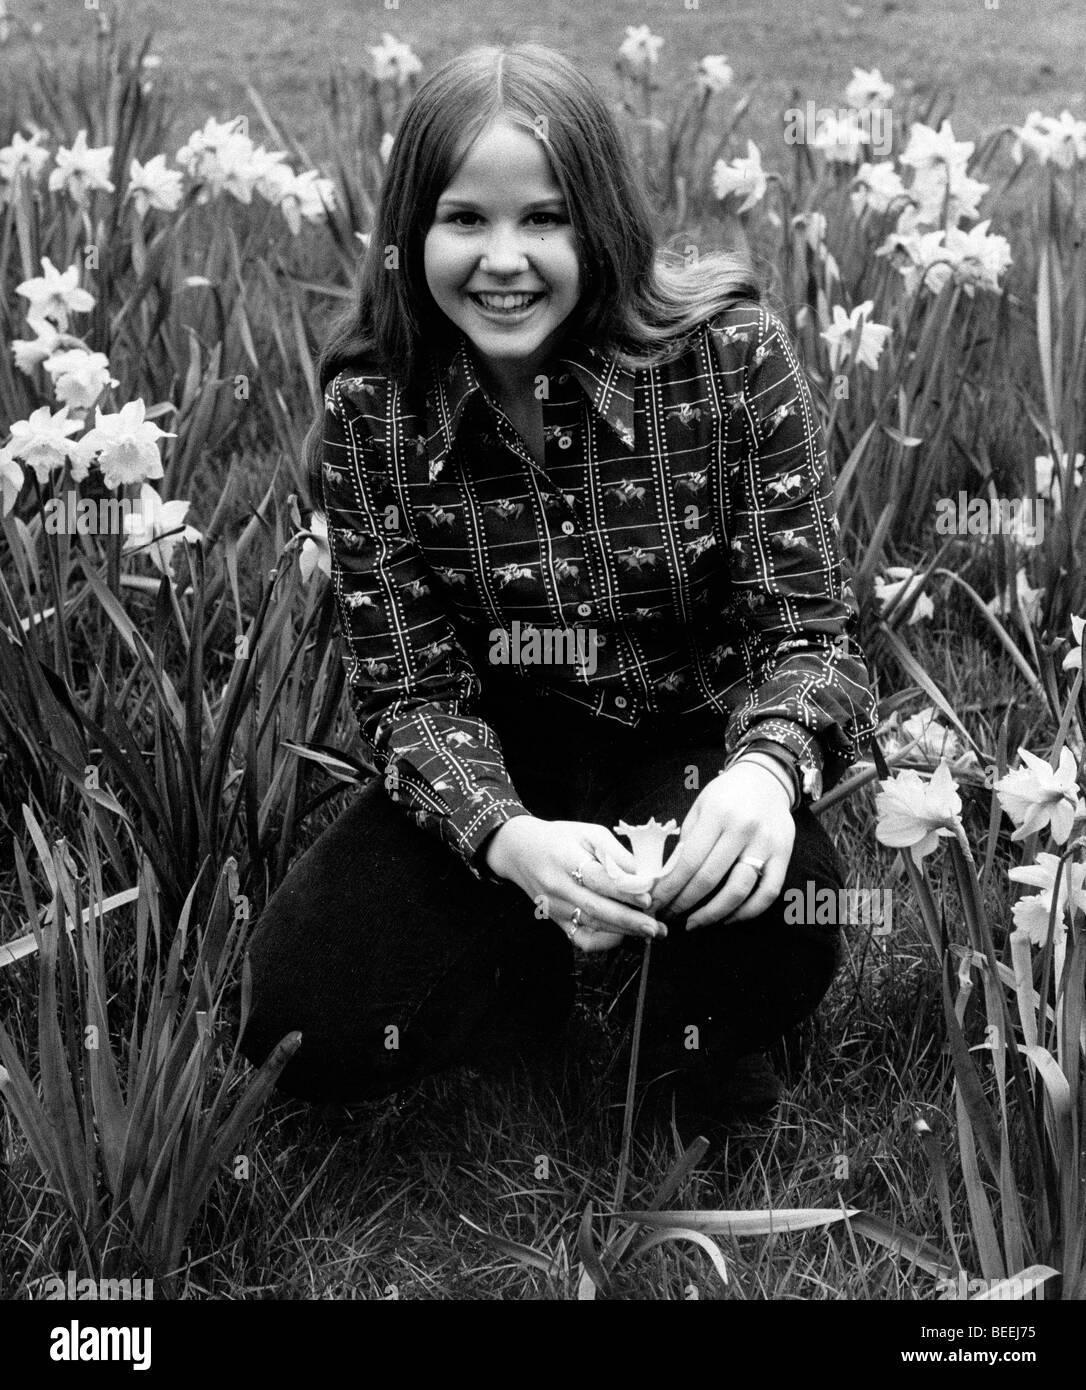 Actress Linda Blair posing with flowers. Stock Photo